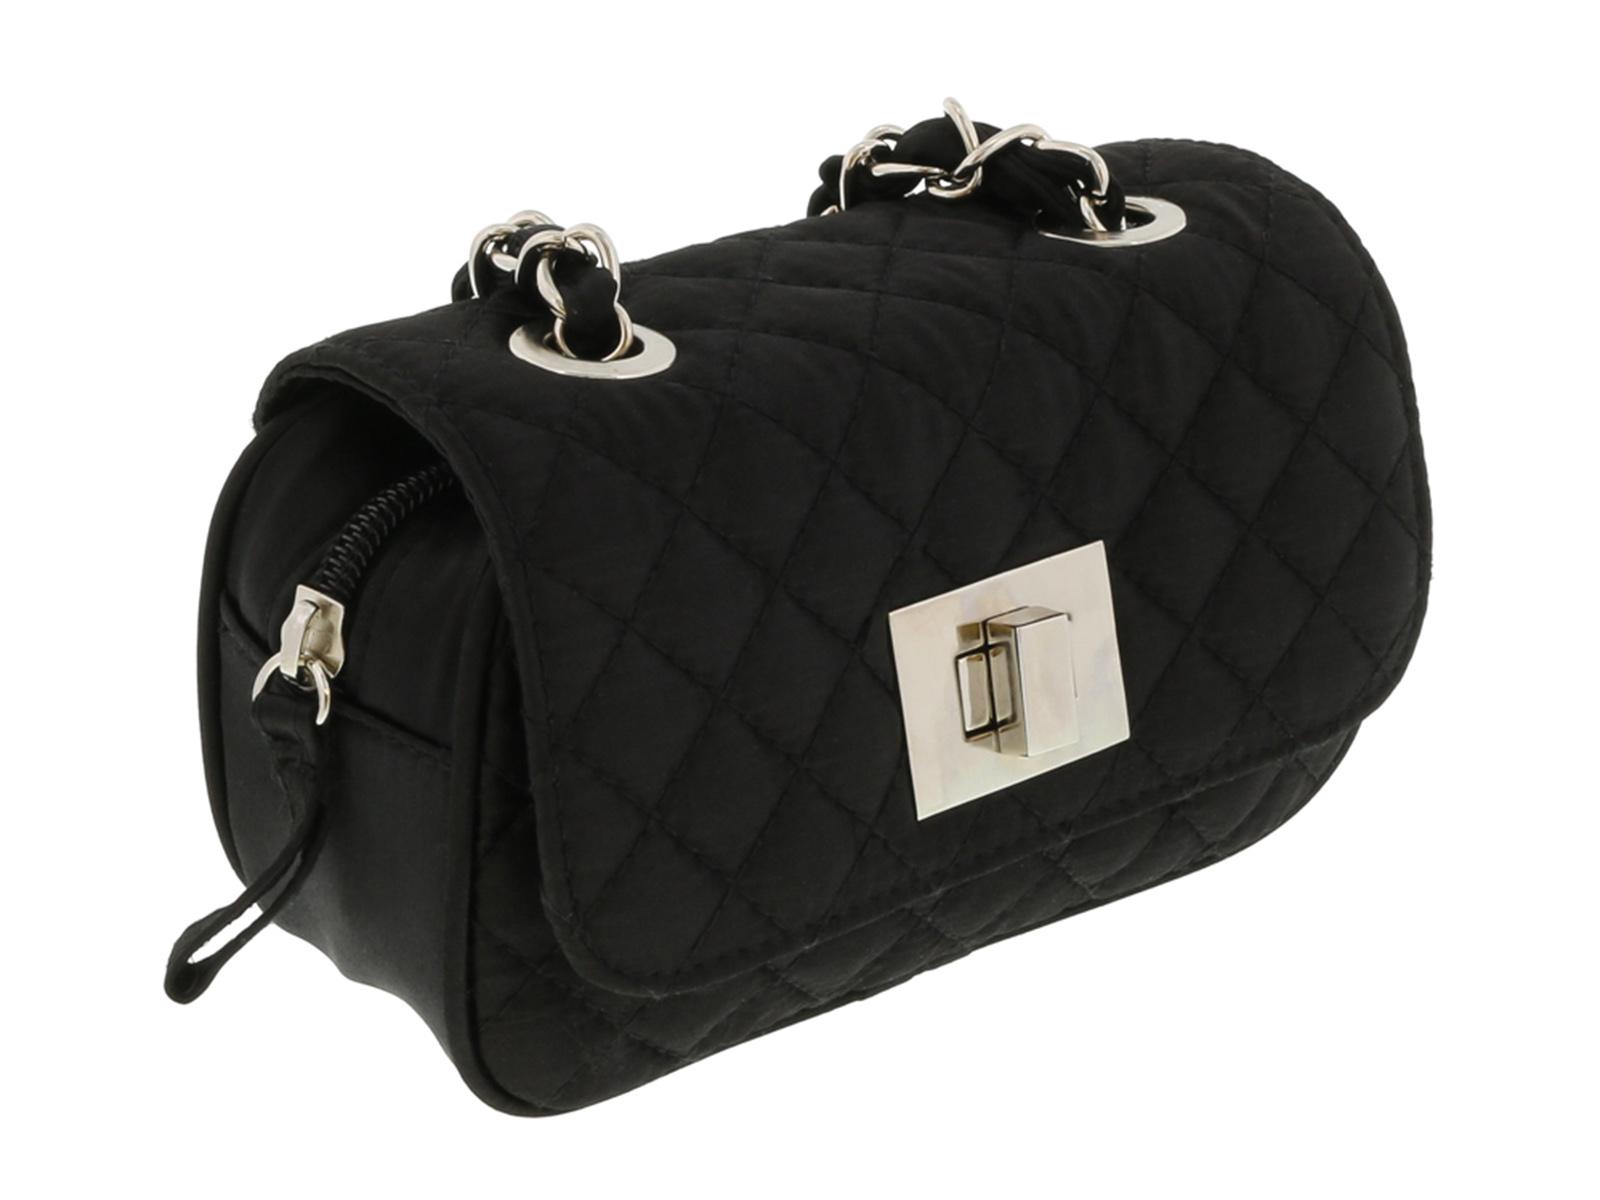 Scheilan  Black Satin Quilted Boxy Crossbody Bag